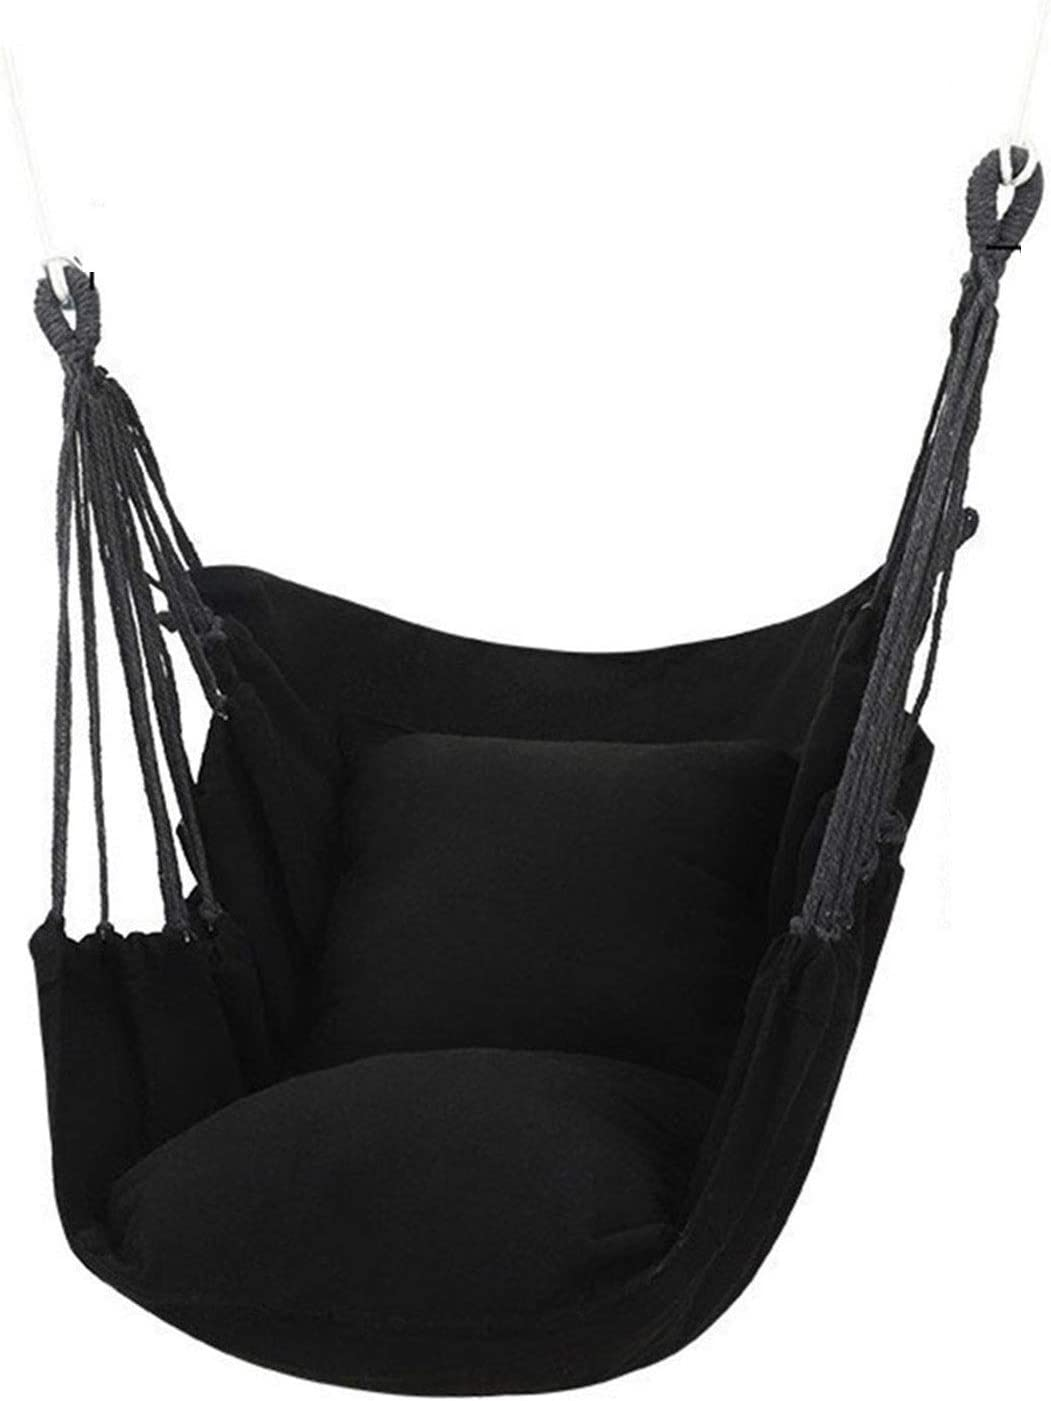 MLDTX Hanging Rope Hammock Chair Las Vegas Mall Swing 440Lbs Soft-S - Seat- Very popular Max